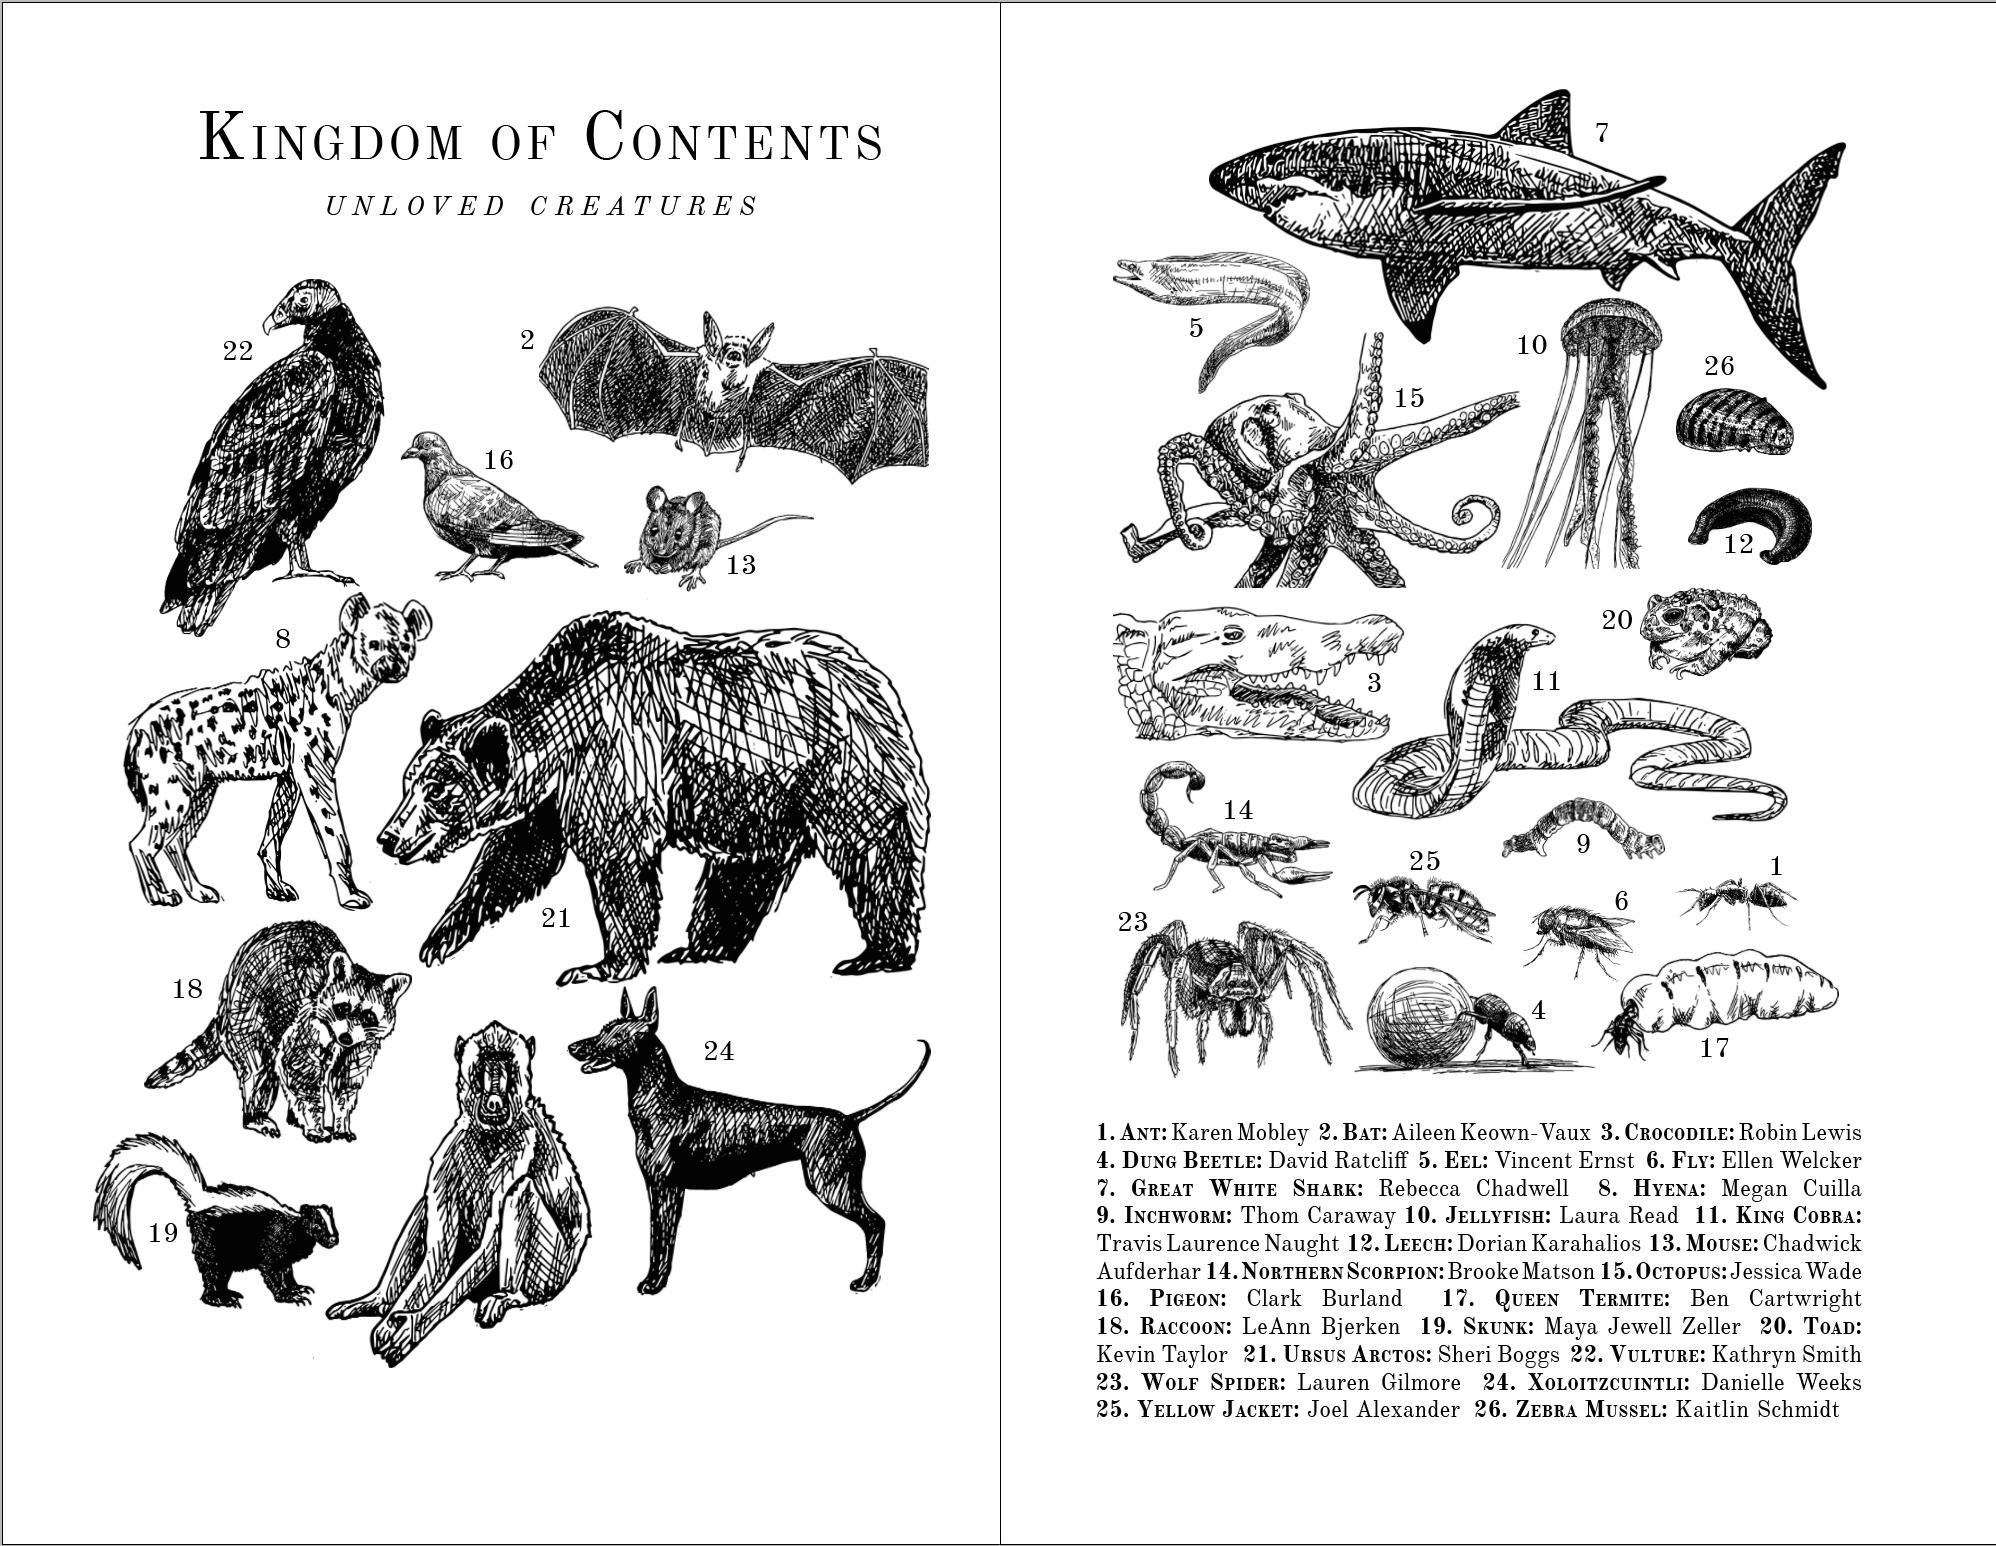 Kingdom of Contents